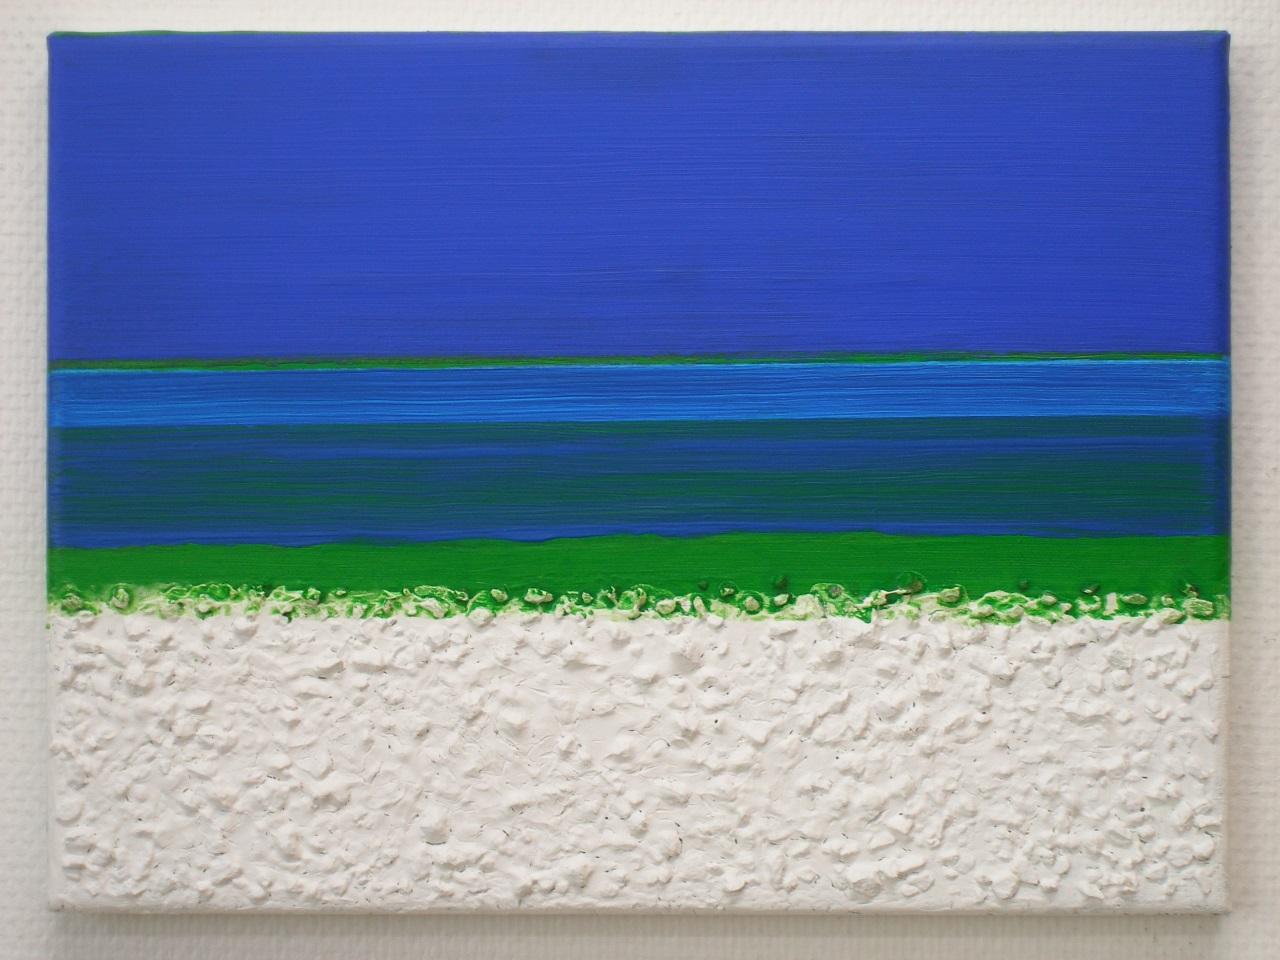 Blue moods I, acrylics - mixed media on canvas, 30x40cm